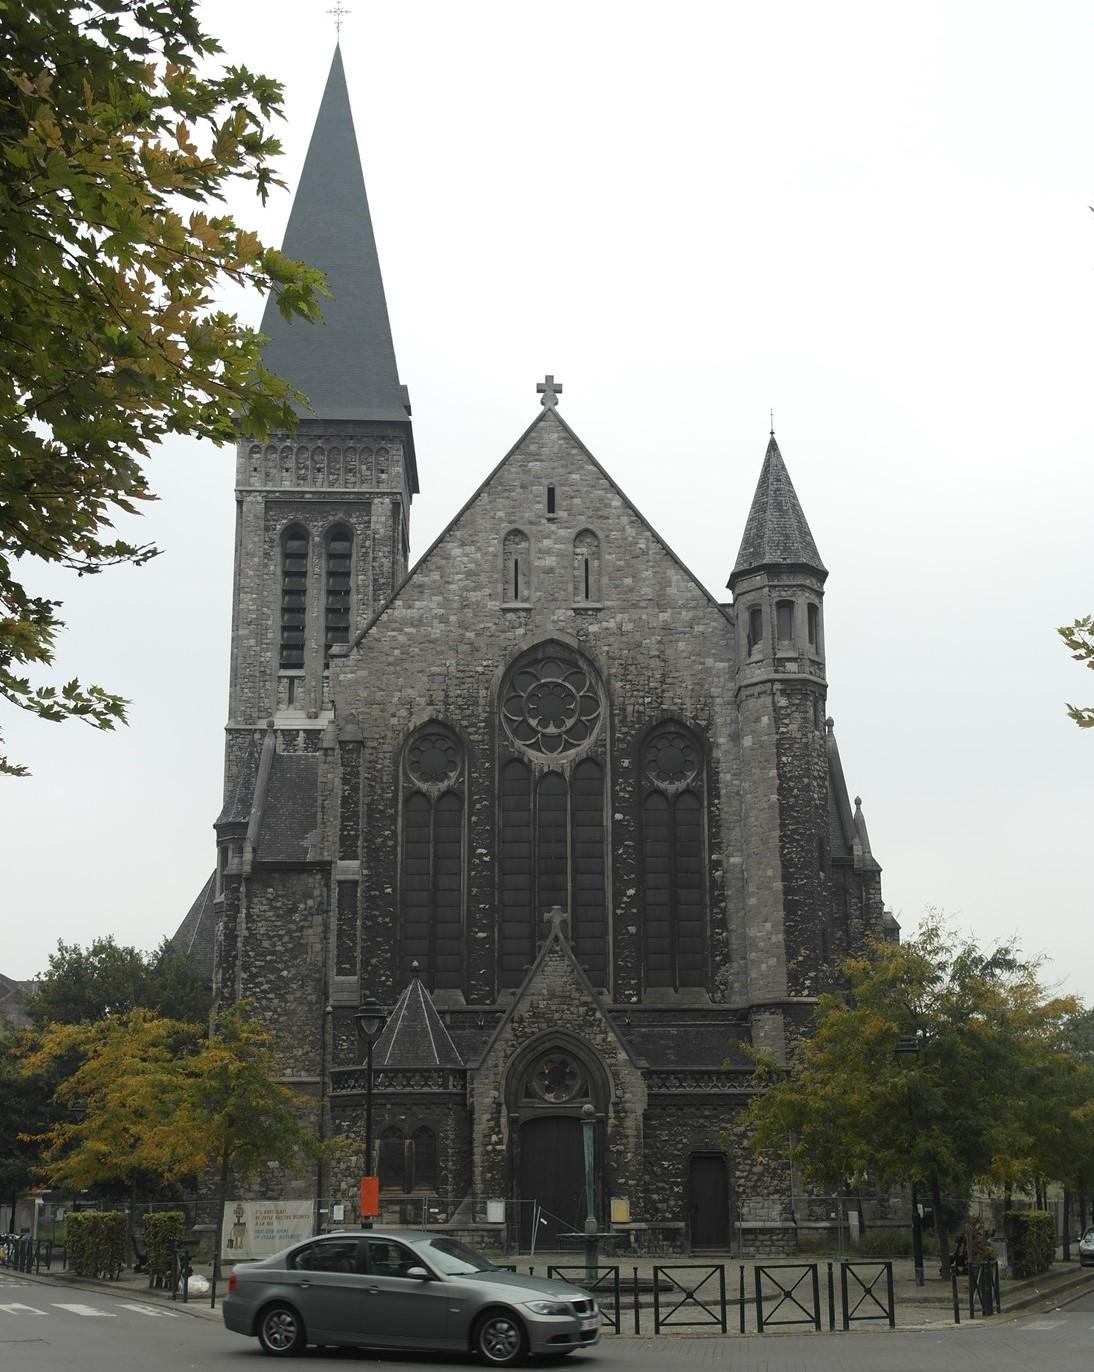 Rue Eloy 75, Eglise Saint-François-Xavier, 2015